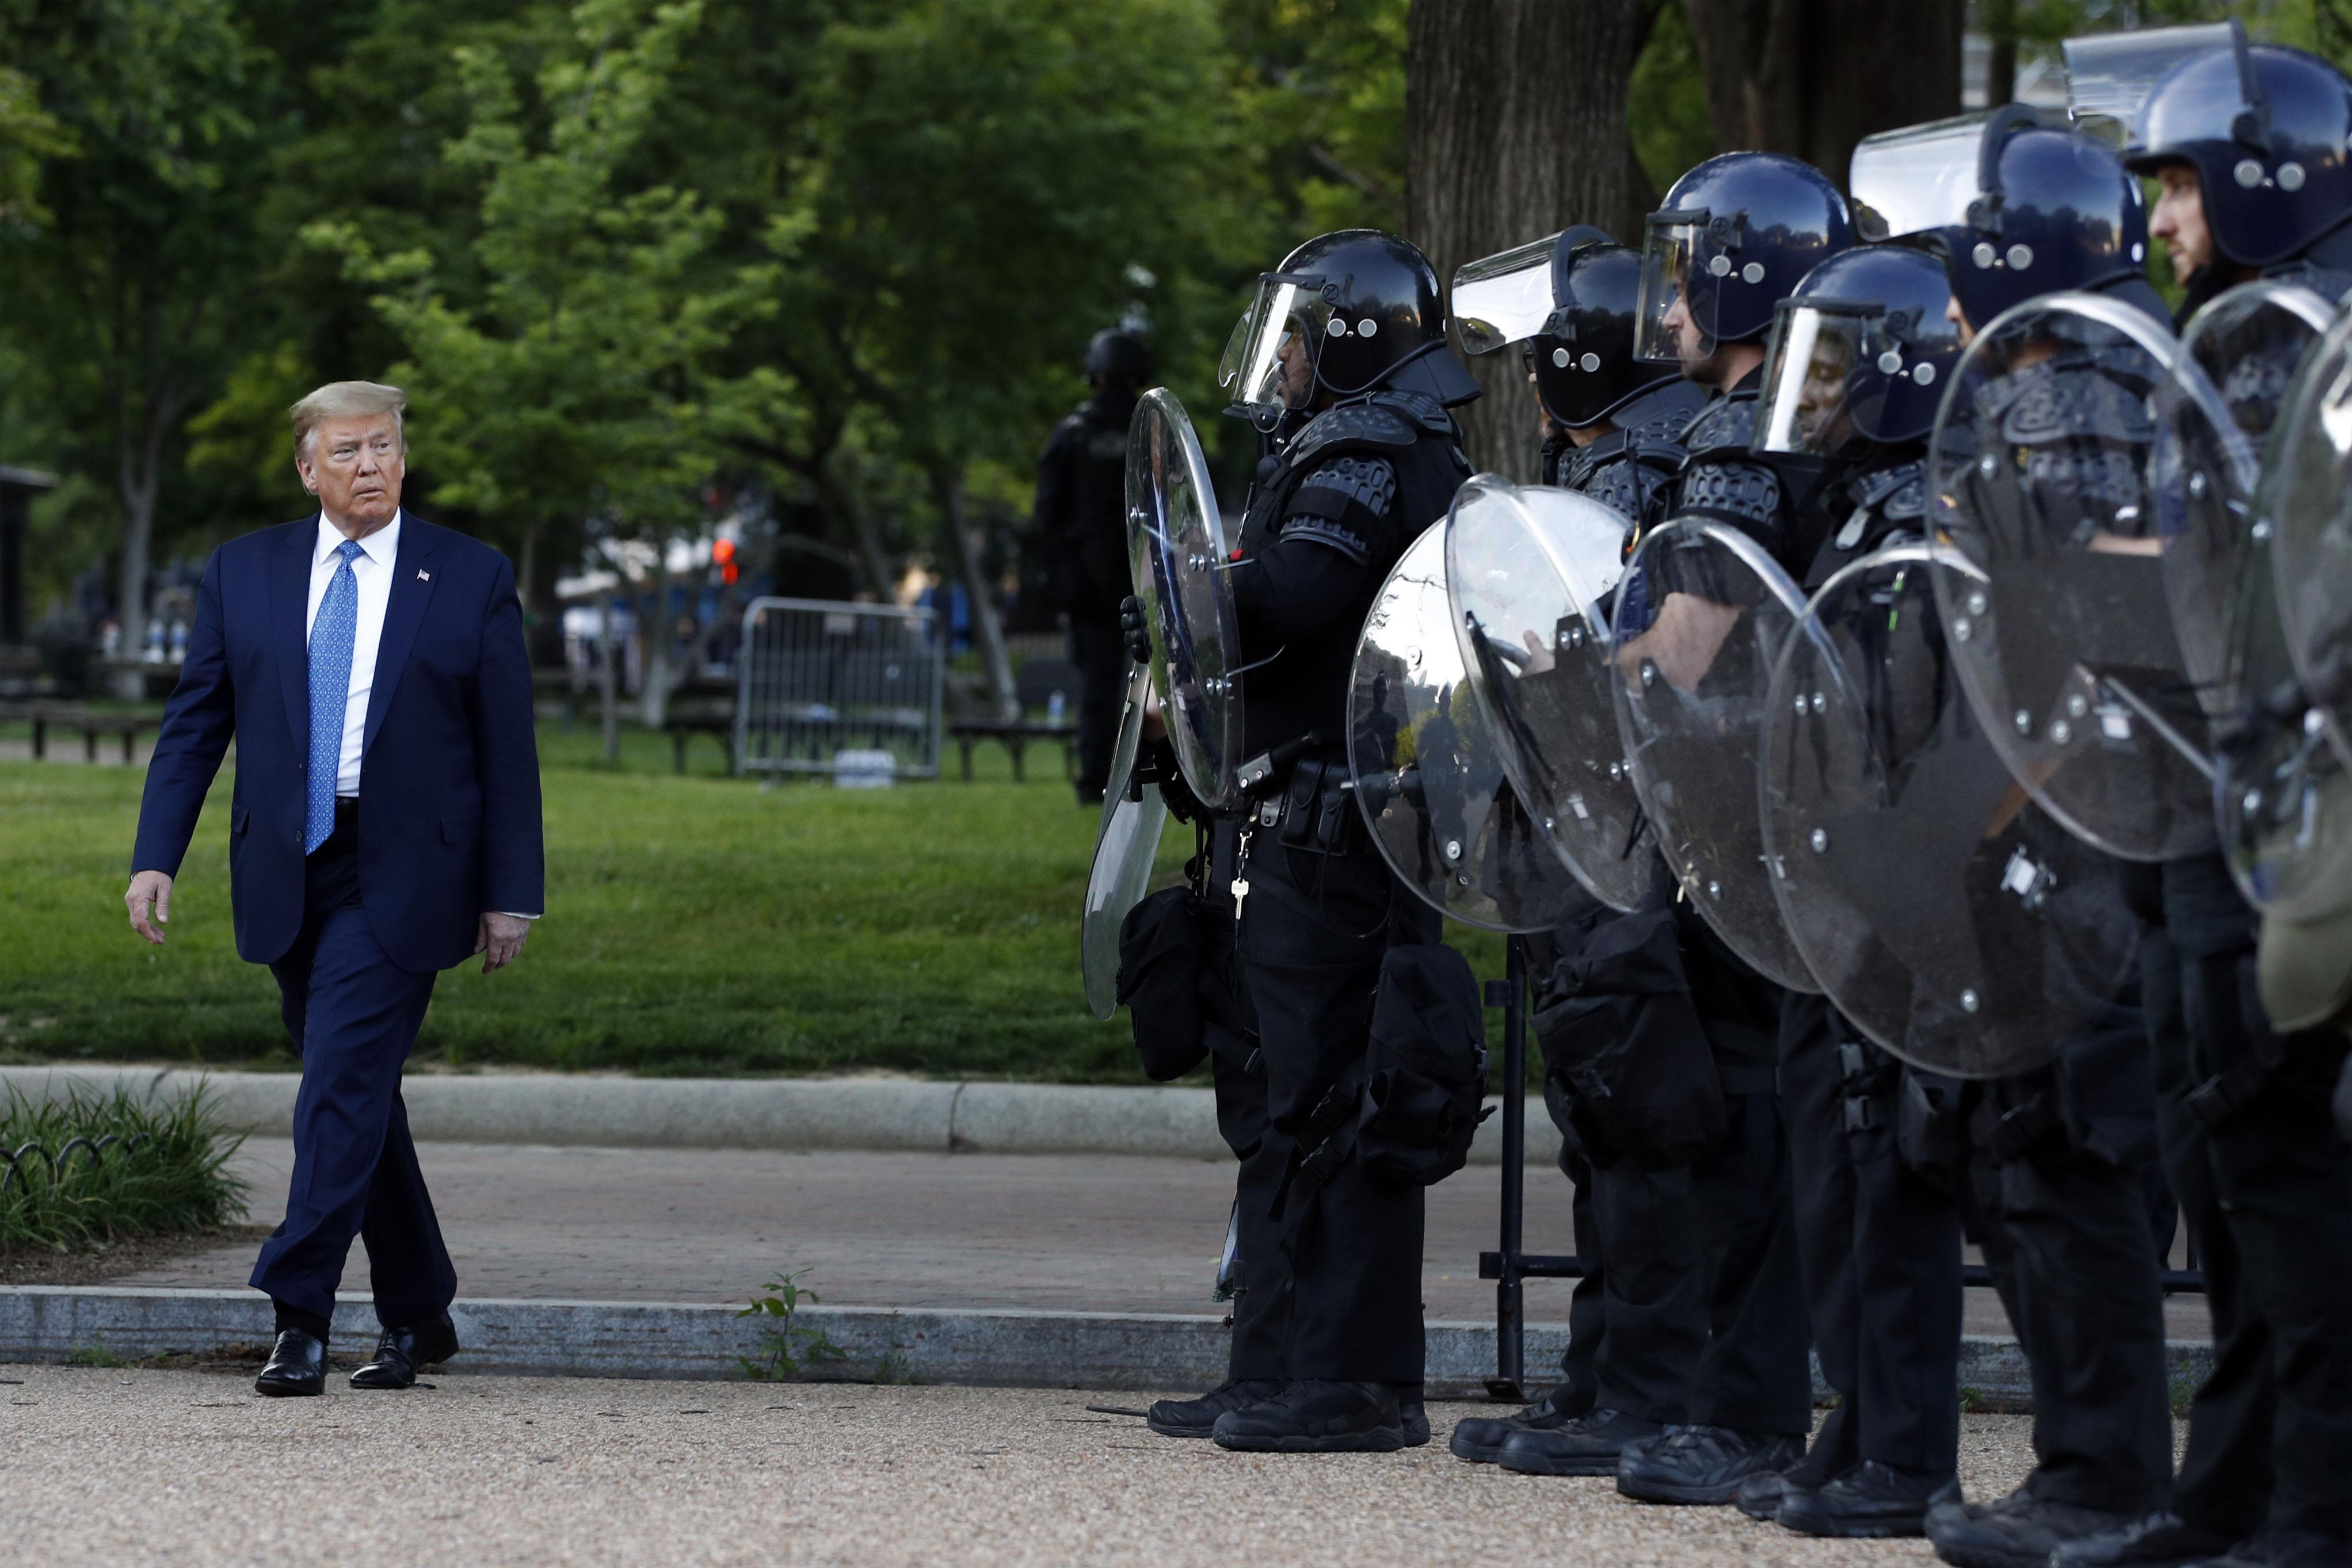 President Donald Trump walks past police officers in Washington's Lafayette Park on June 1st.